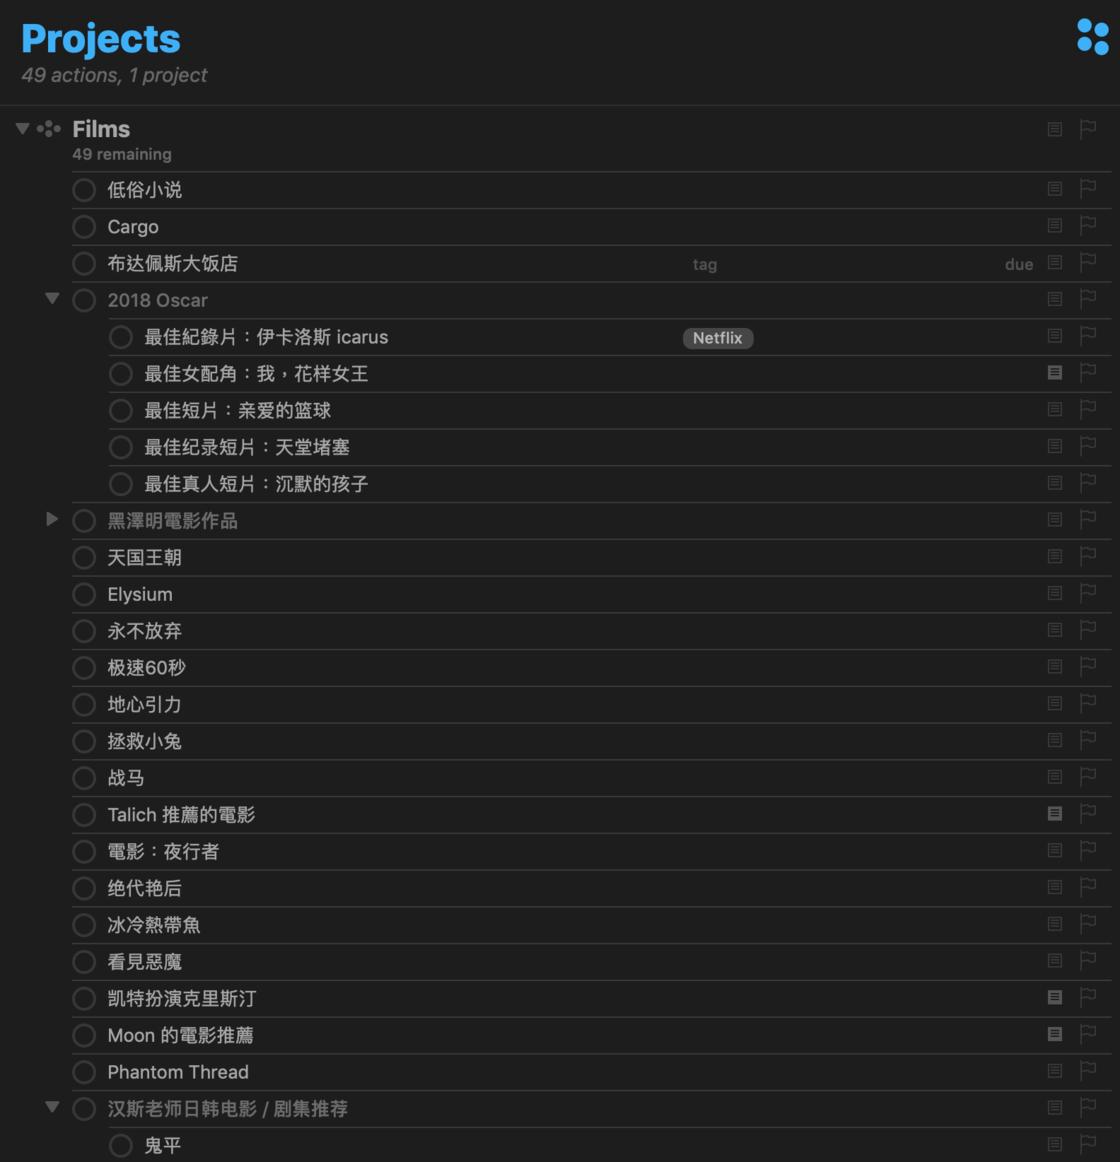 之前我用 OmniFocus 管理片单,信息量比 Airtable 少了好多